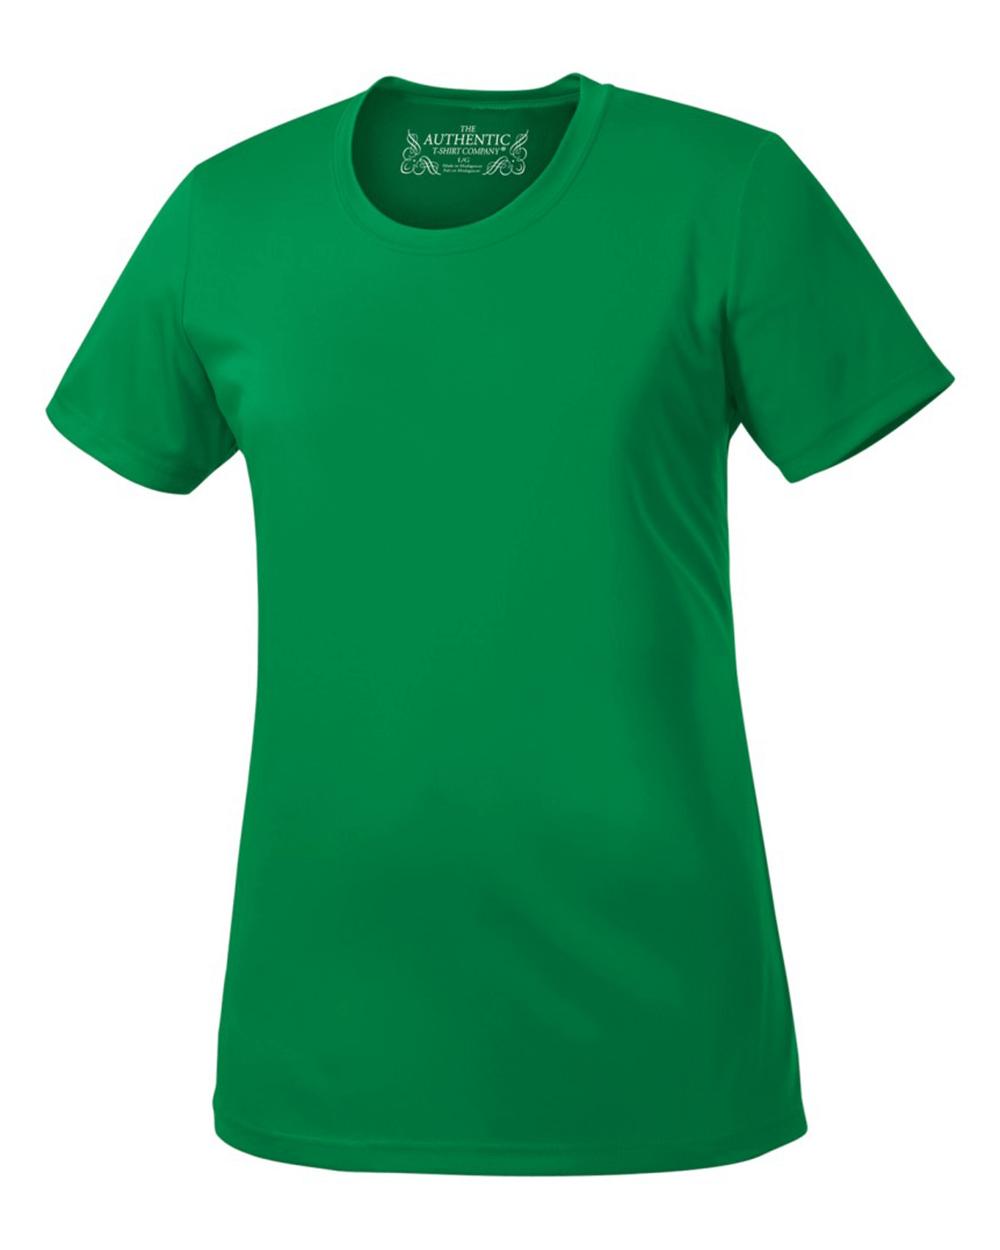 Pro Team Ladies' T-Shirt